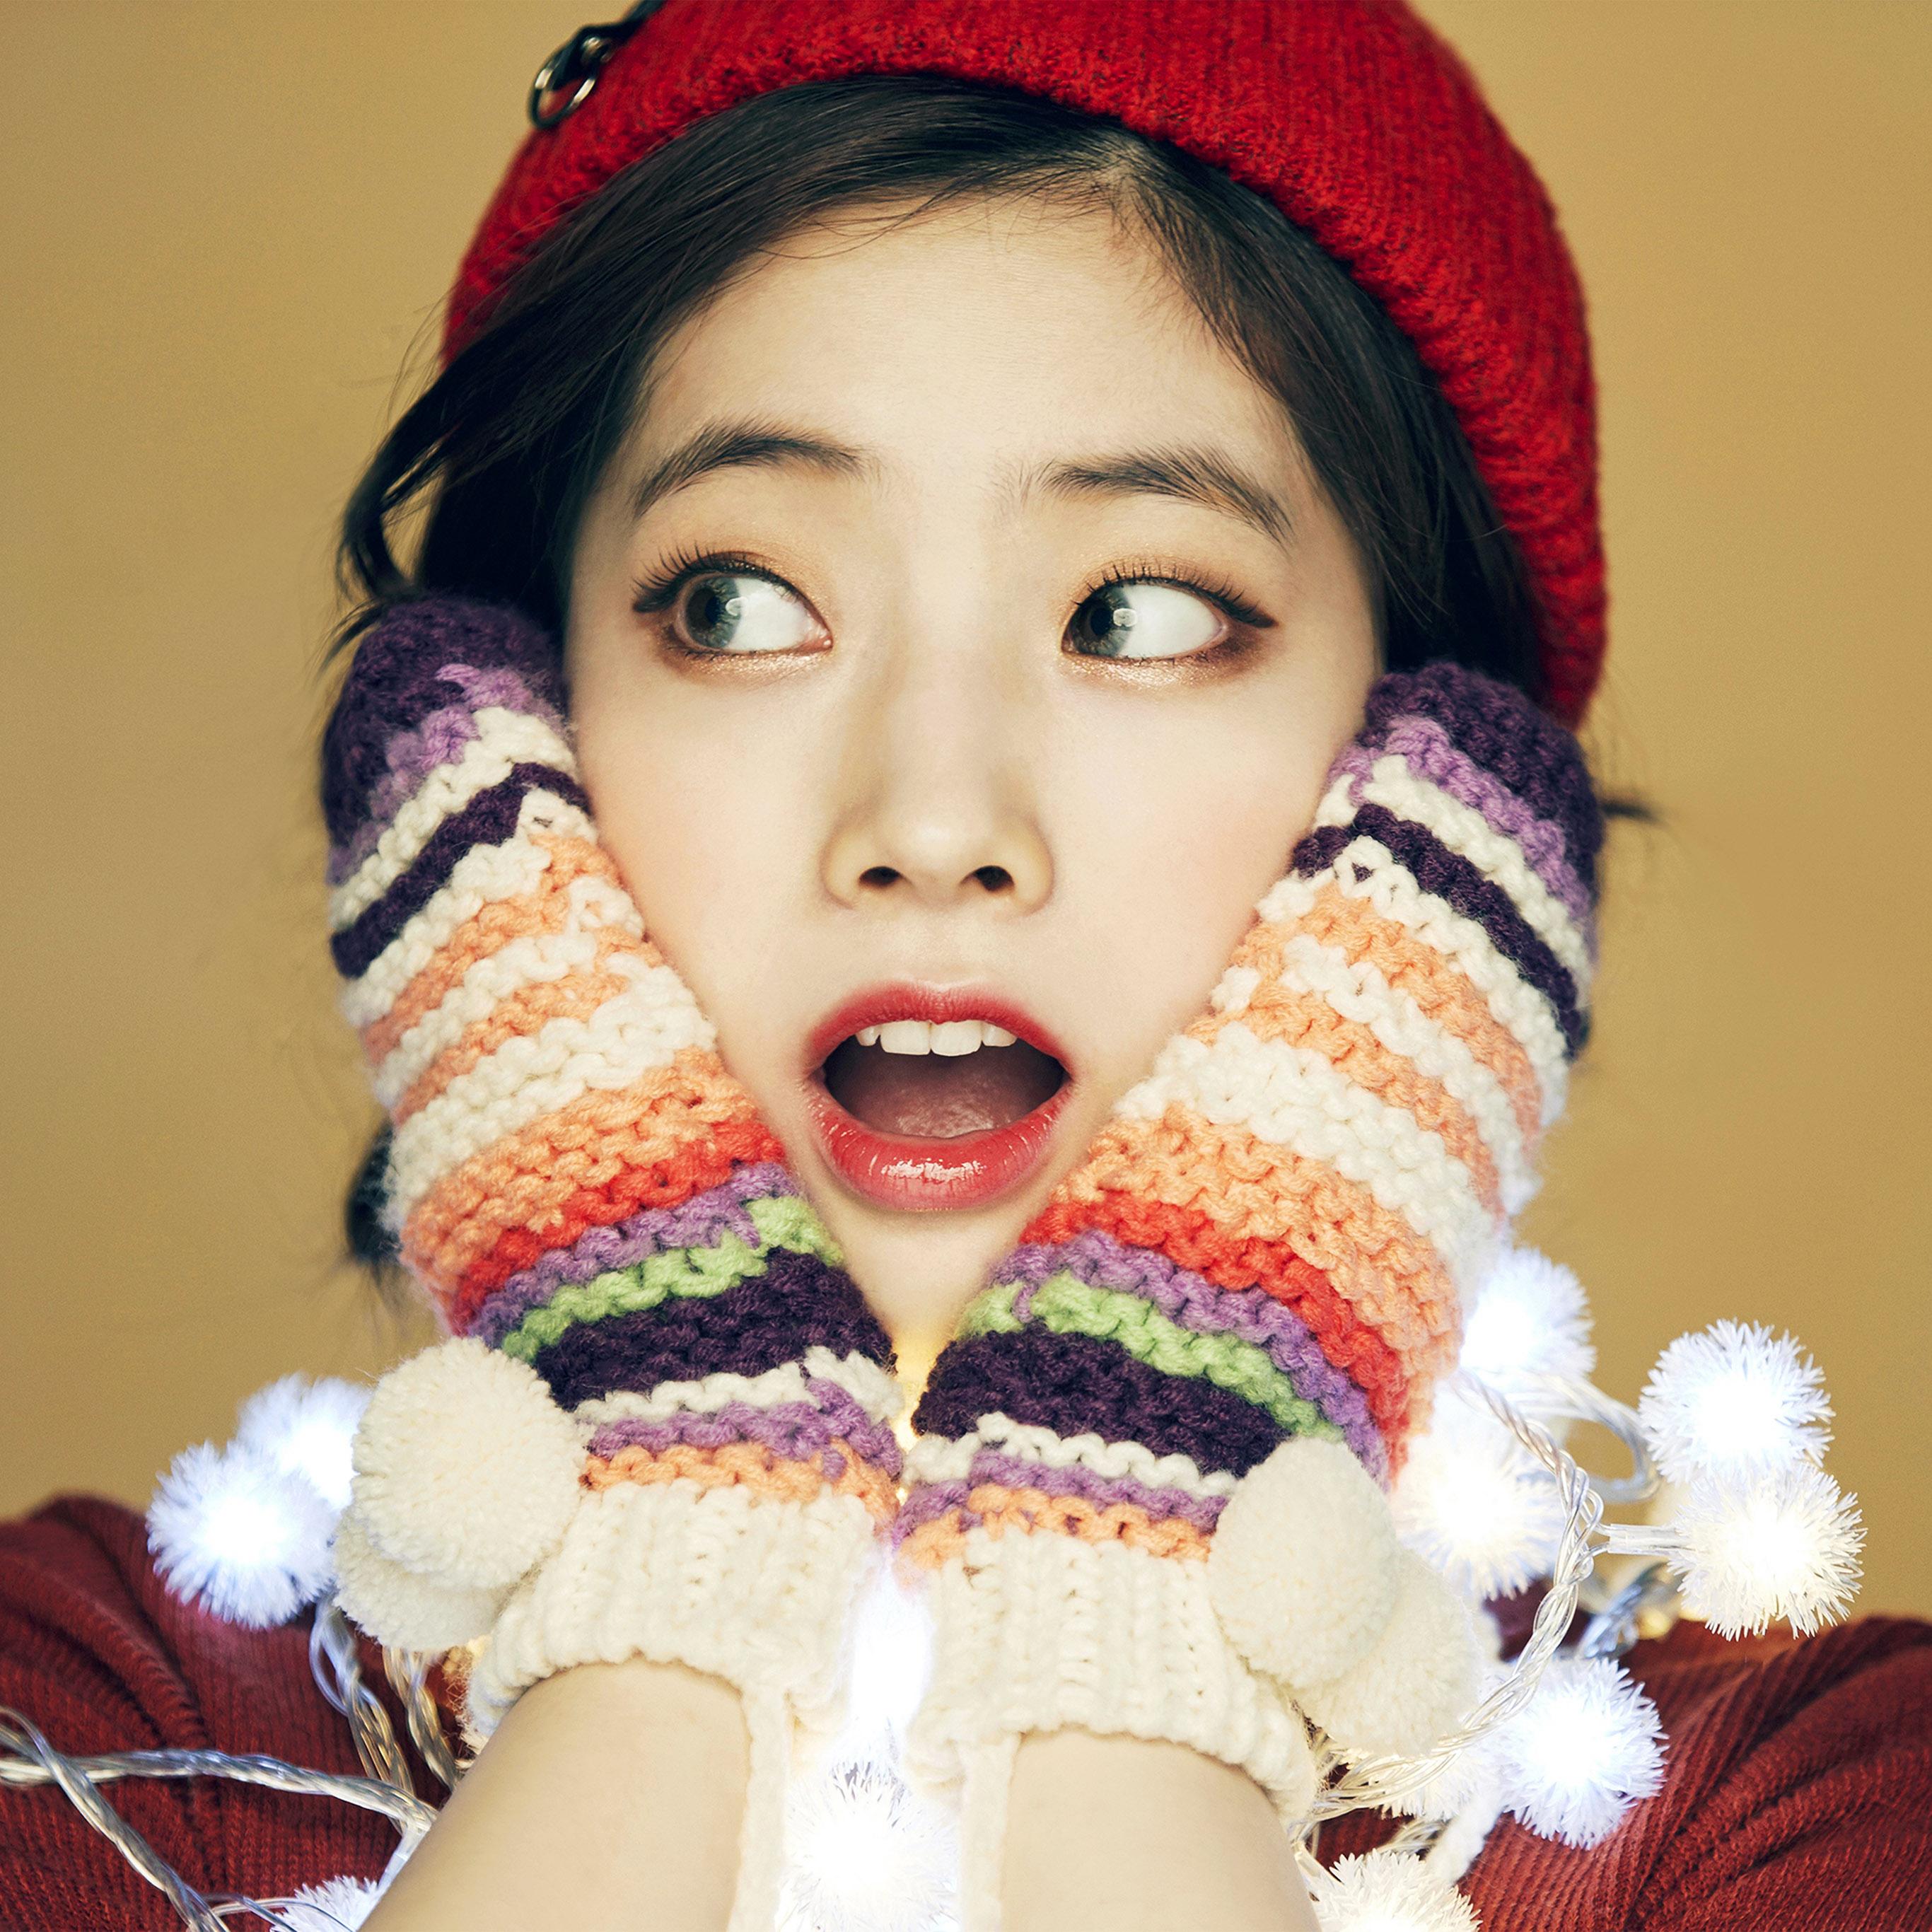 Hp21 Girl Cute Surprise Kpop Winter Asian Wallpaper